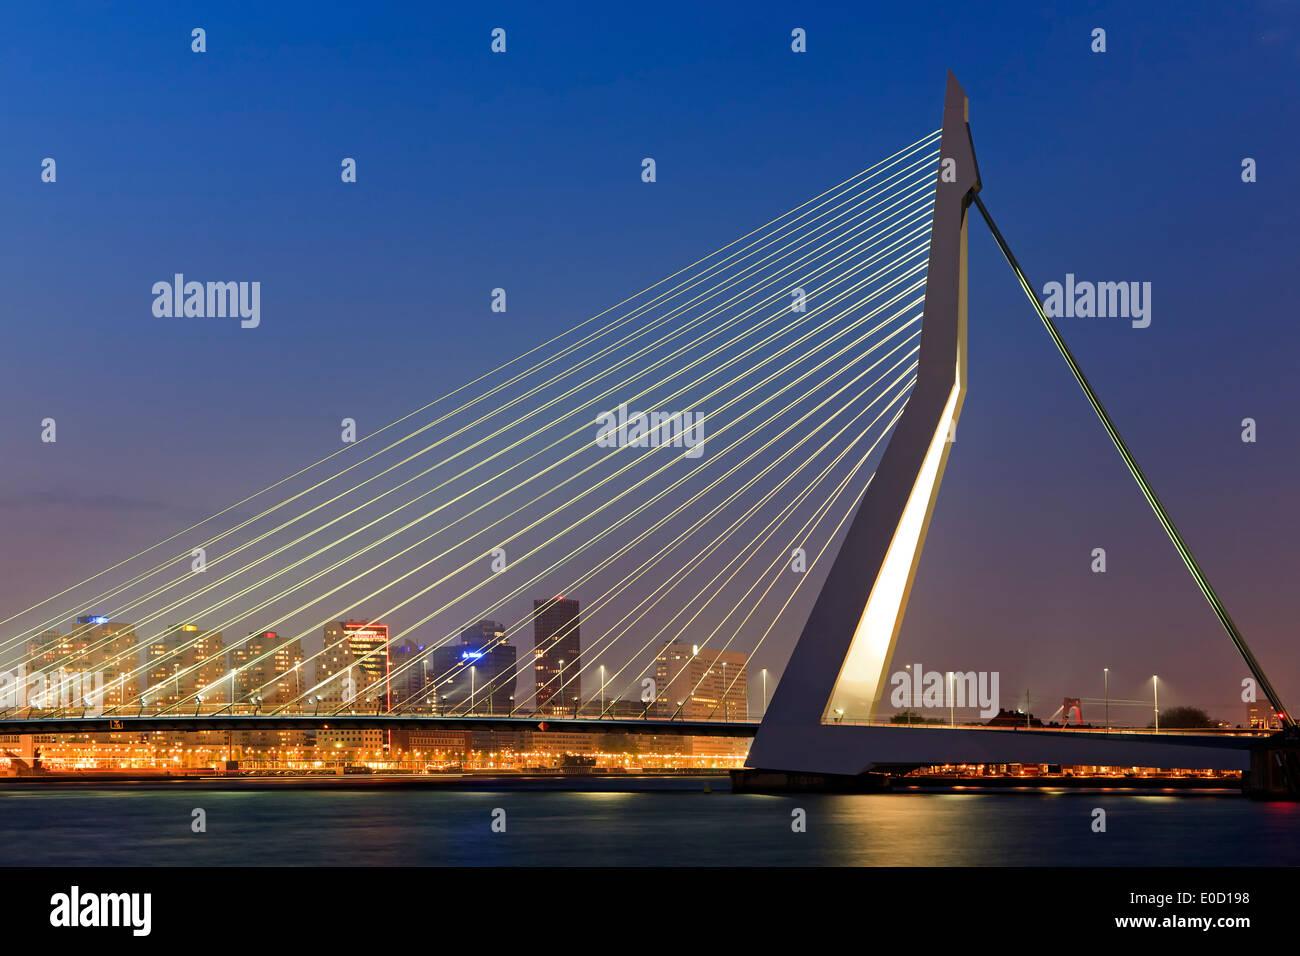 Erasmusbrug (Ponte Erasmus) e sullo skyline al crepuscolo, Rotterdam, Paesi Bassi Immagini Stock